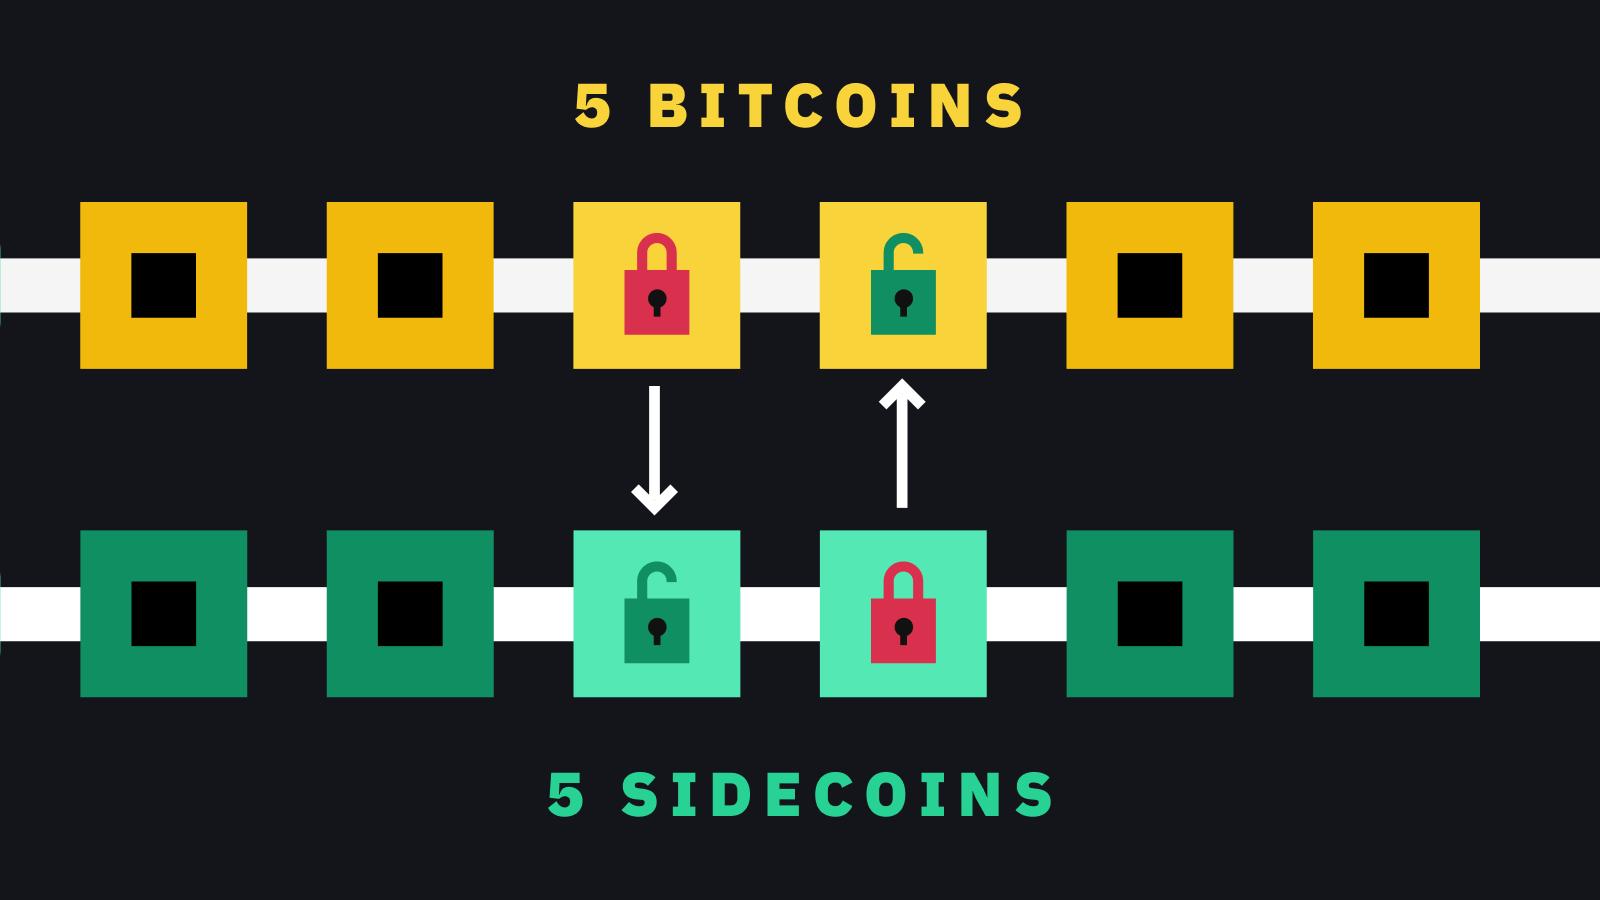 Sidechain scaling